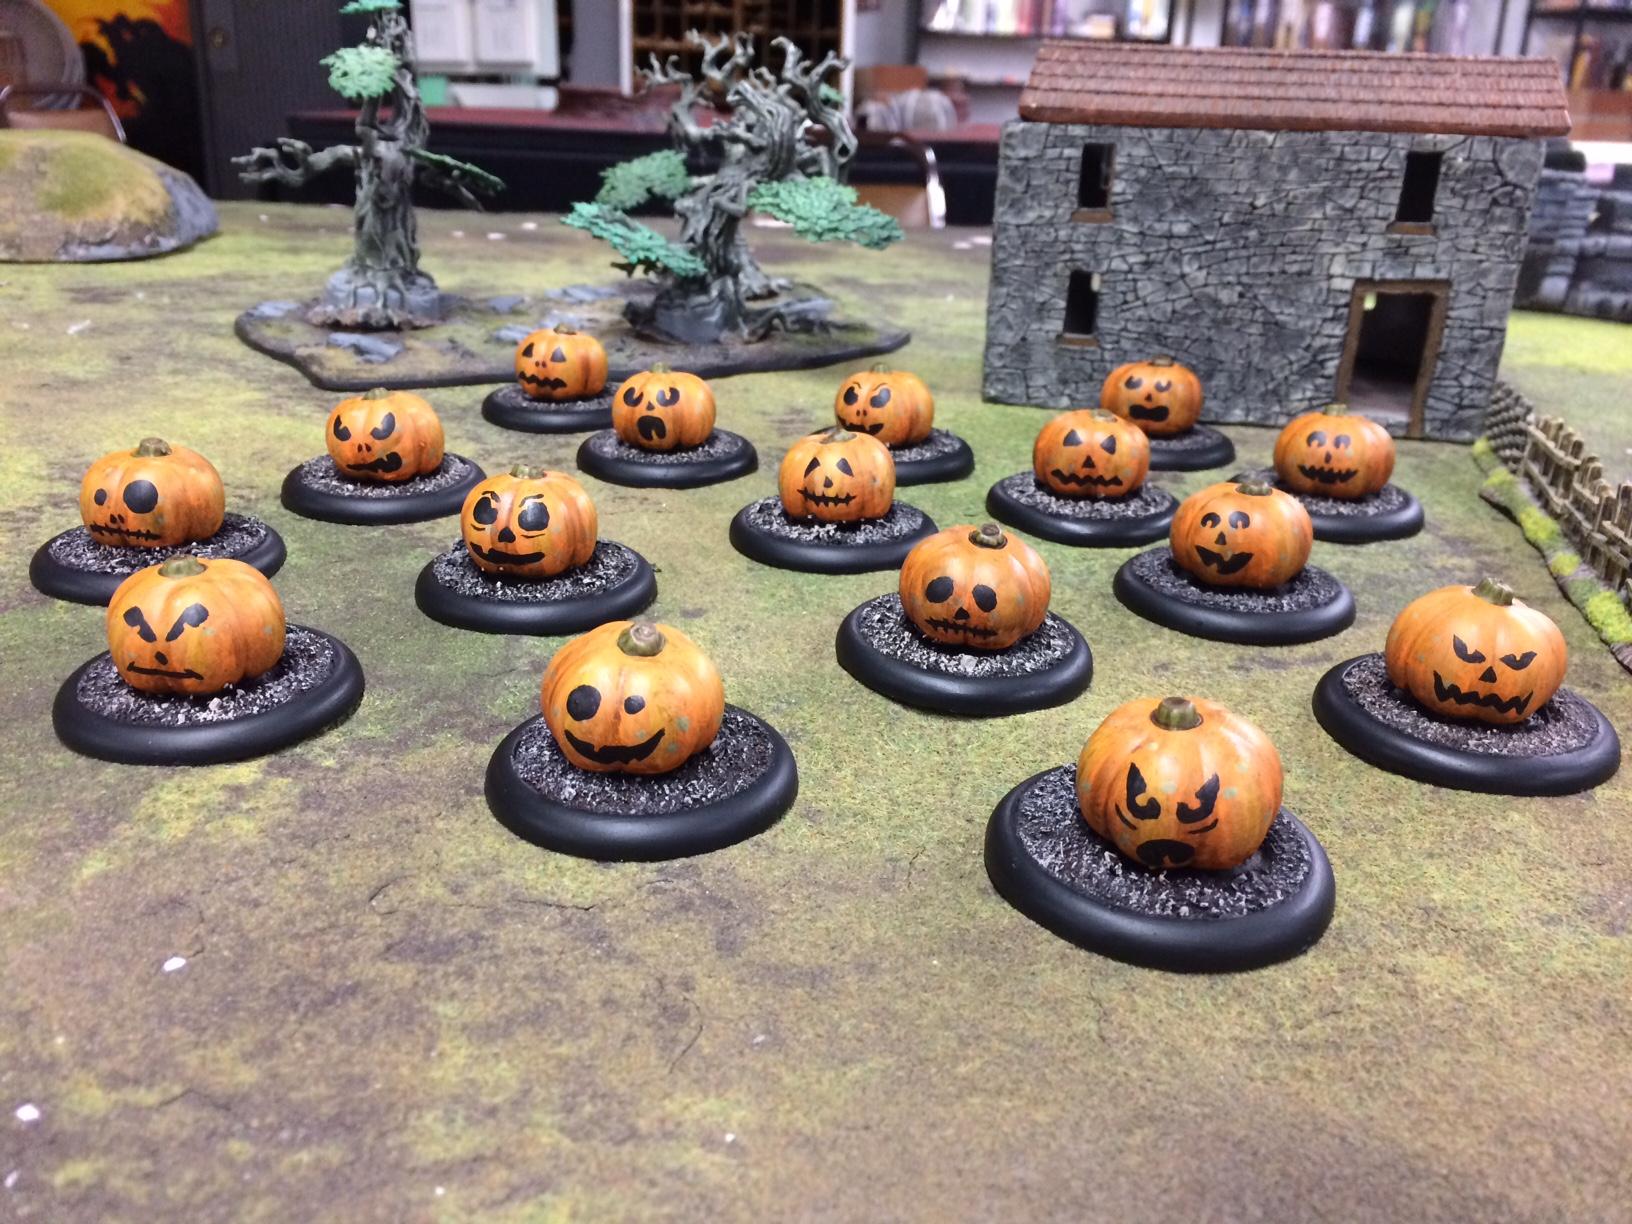 bell-of-lost-souls-warmachine-scream-roller-pumpkins